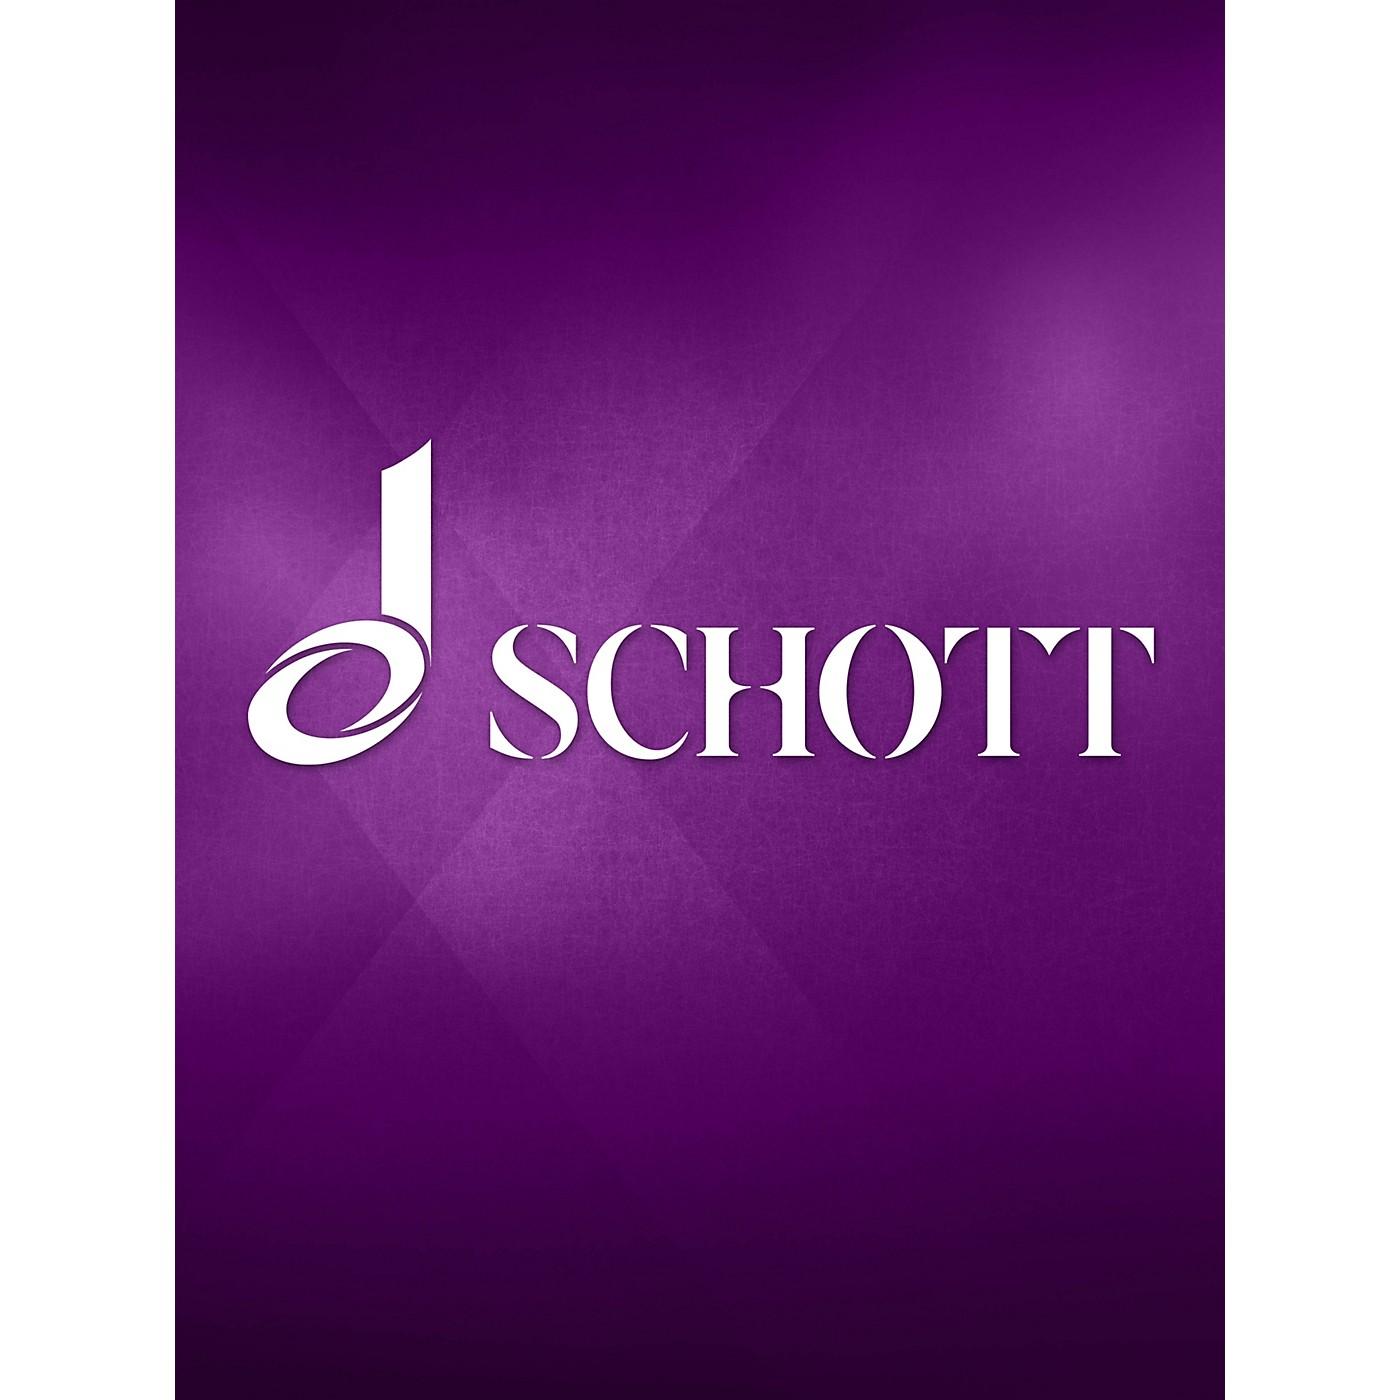 Eulenburg Violin Concerto in A Minor, Op. 53 Schott Composed by Antonín Dvorák Arranged by Antoine Cherbuliez thumbnail